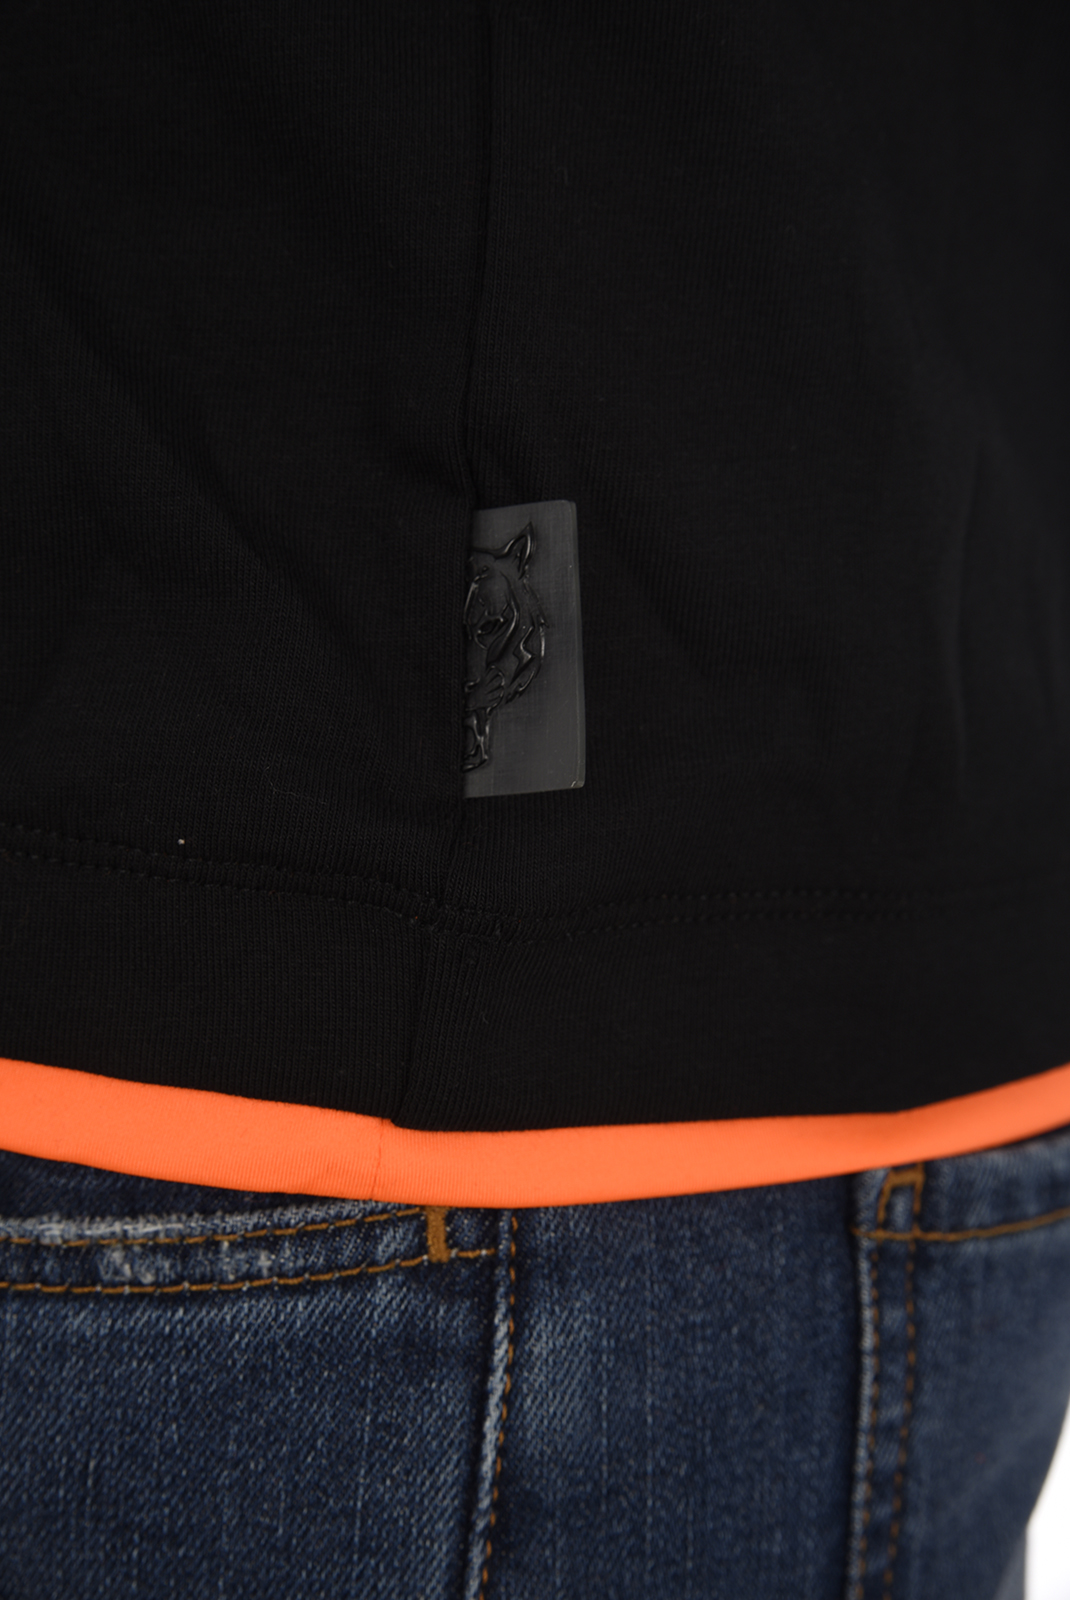 Polos  Plein Sport MTK2161 TIGER RUN 0220 BLACK/ORANGE